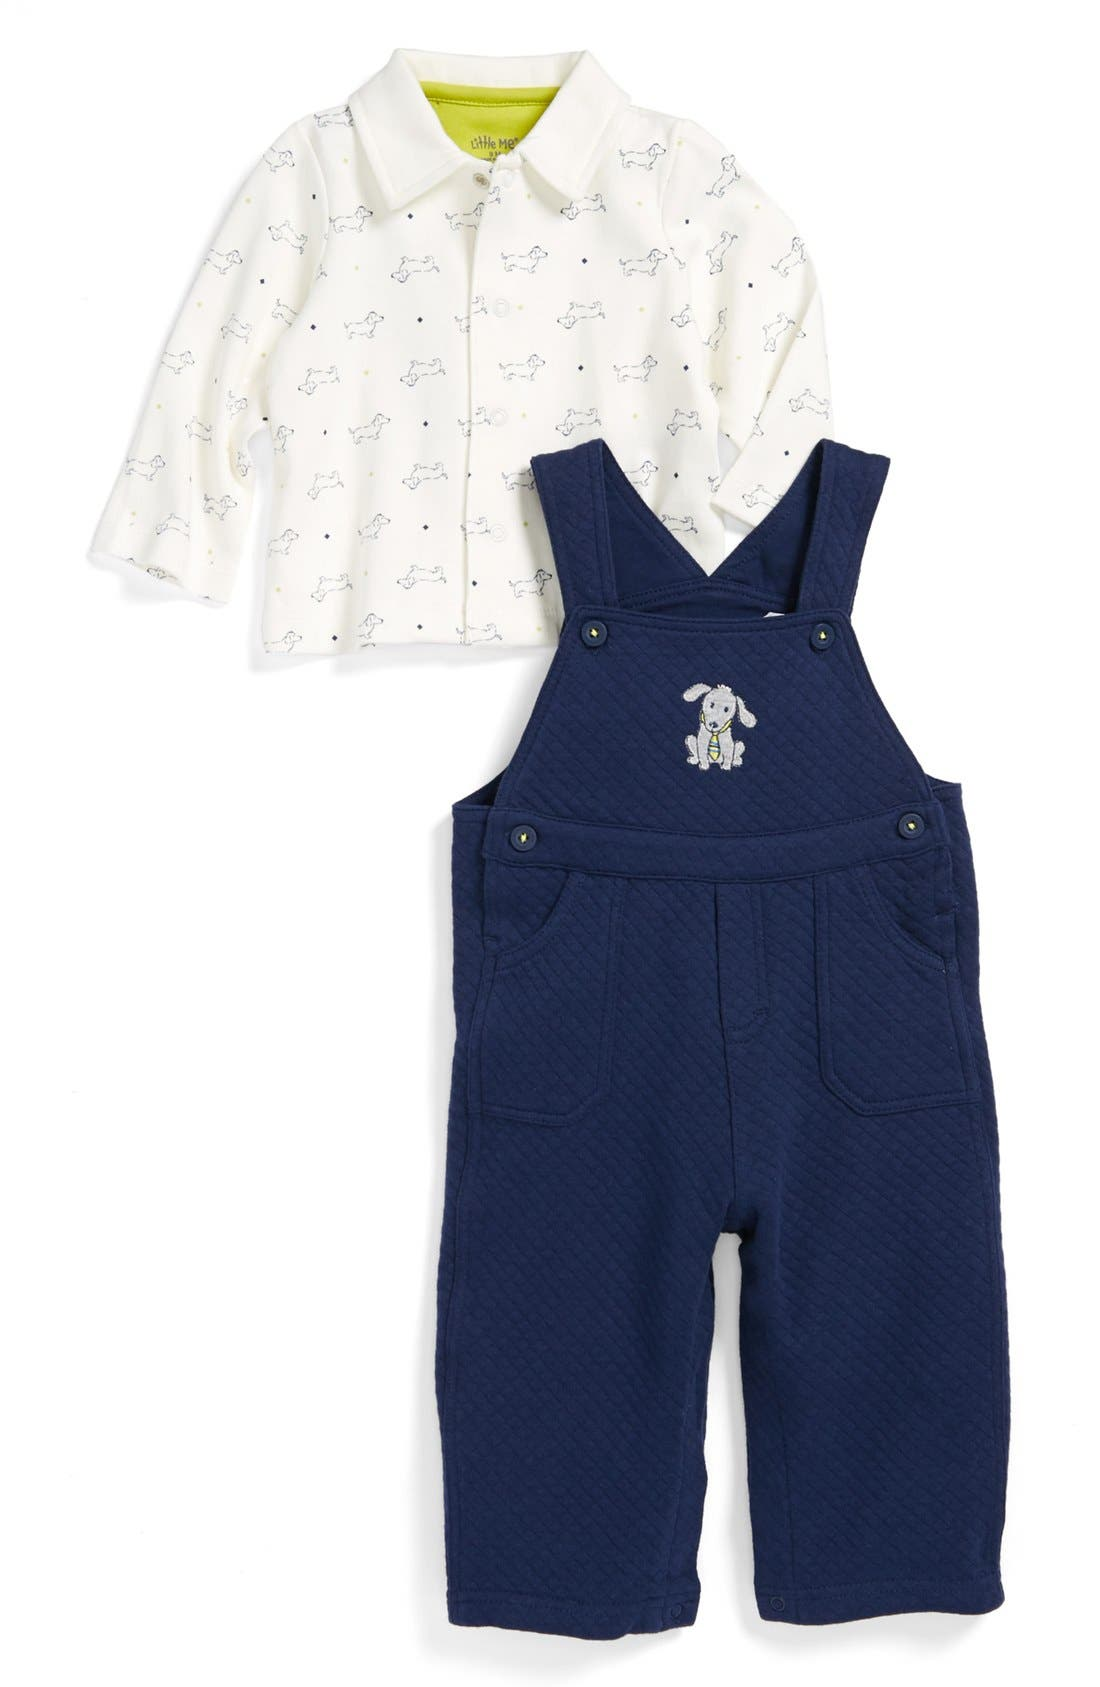 Main Image - Little Me 'Dashing Pups' Shirt & Overalls (Baby Boys)